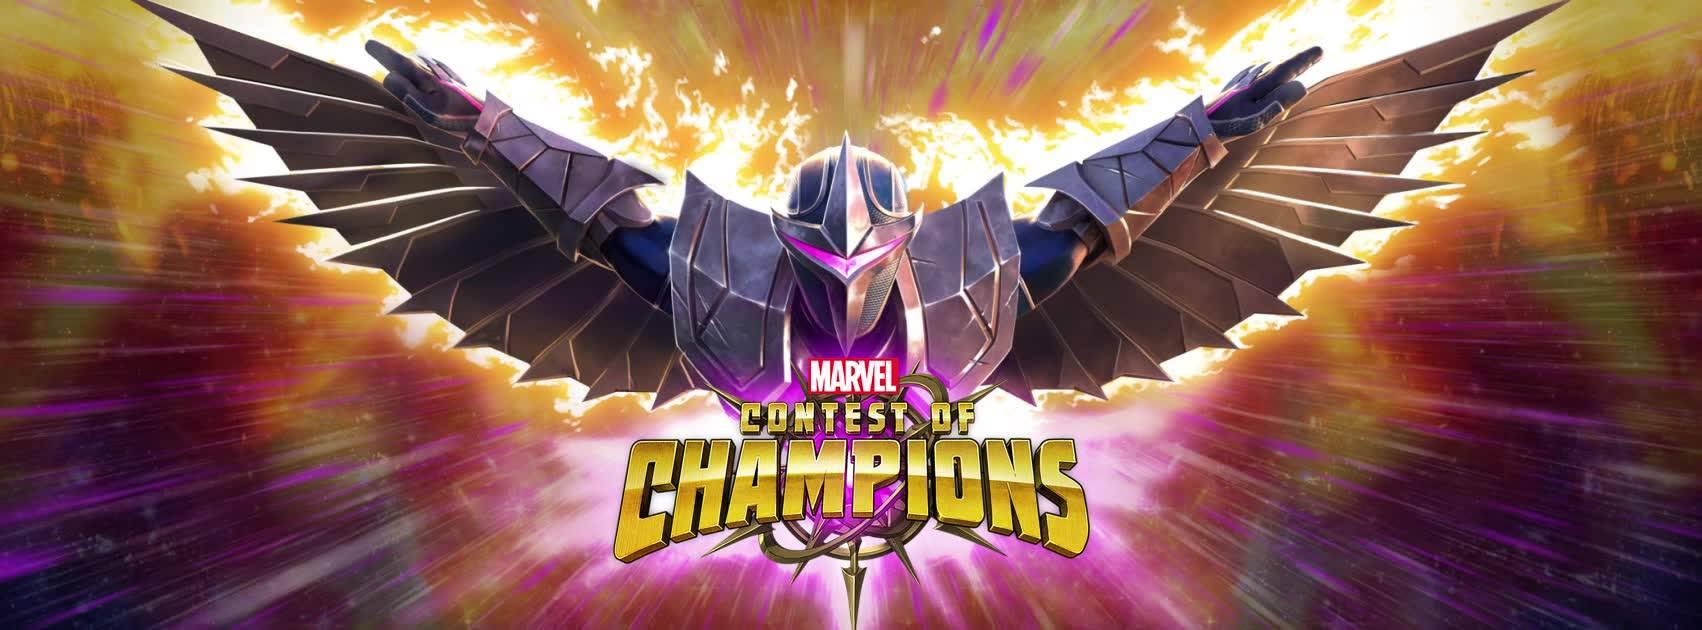 Darkhawk Marvel Contest of Champions